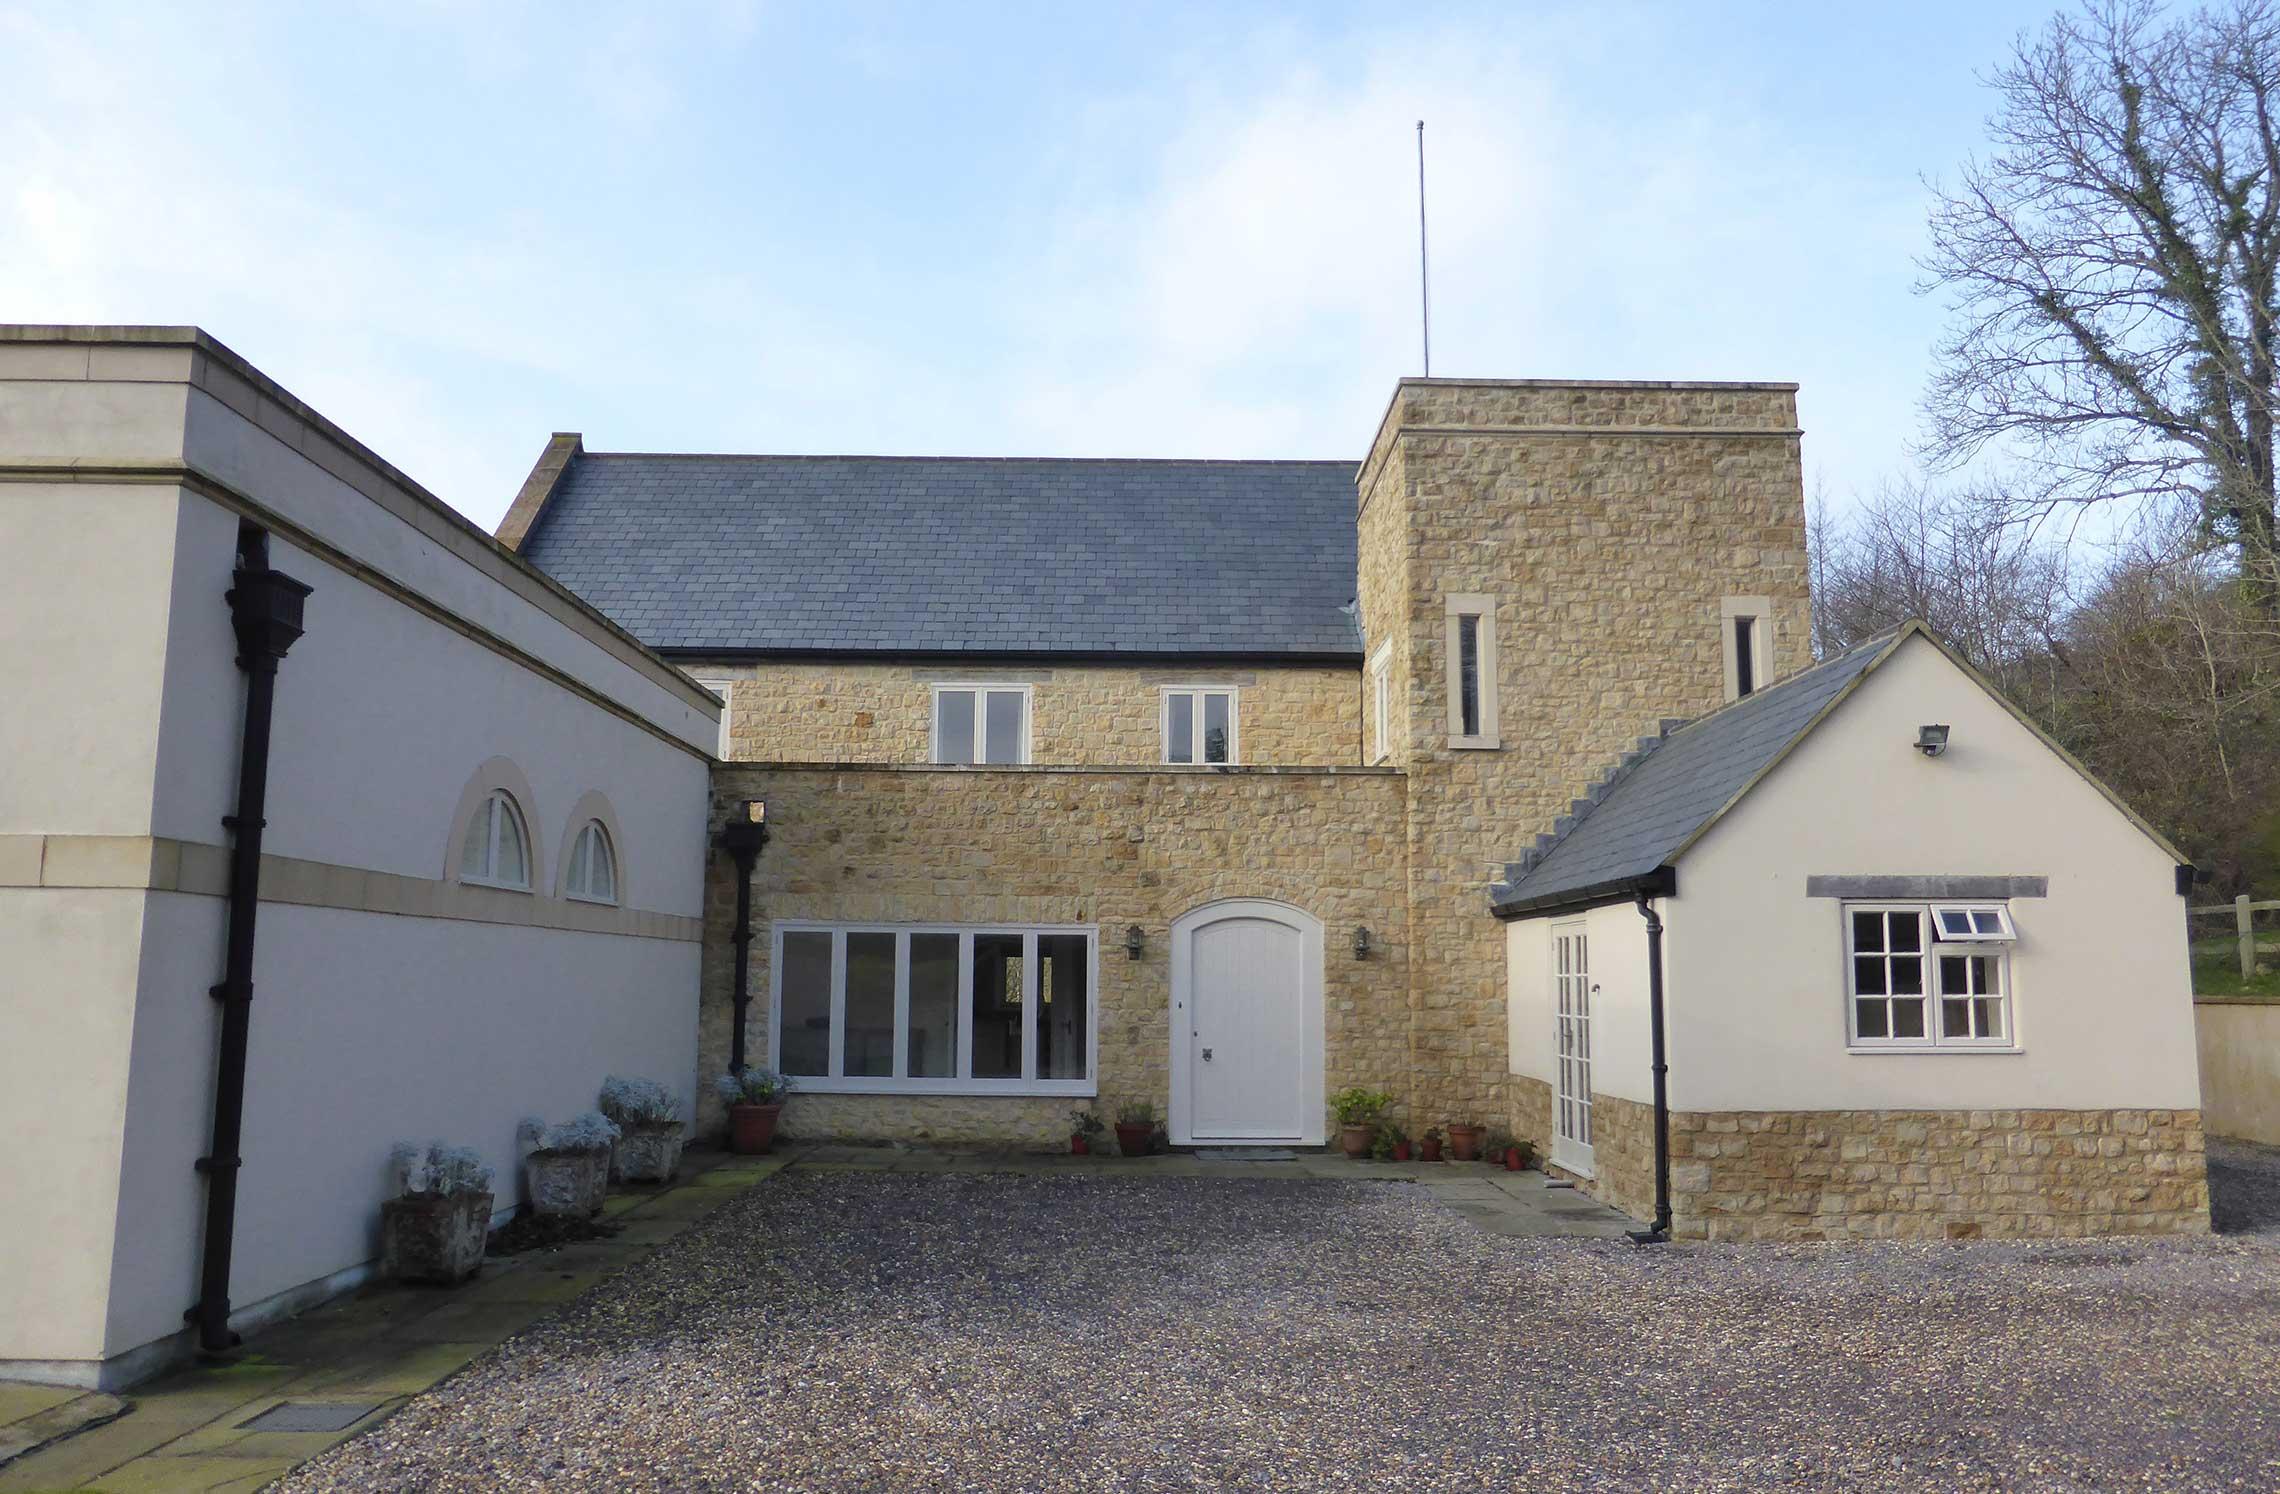 Remodeled Manor House Ben Pentreath Ltd